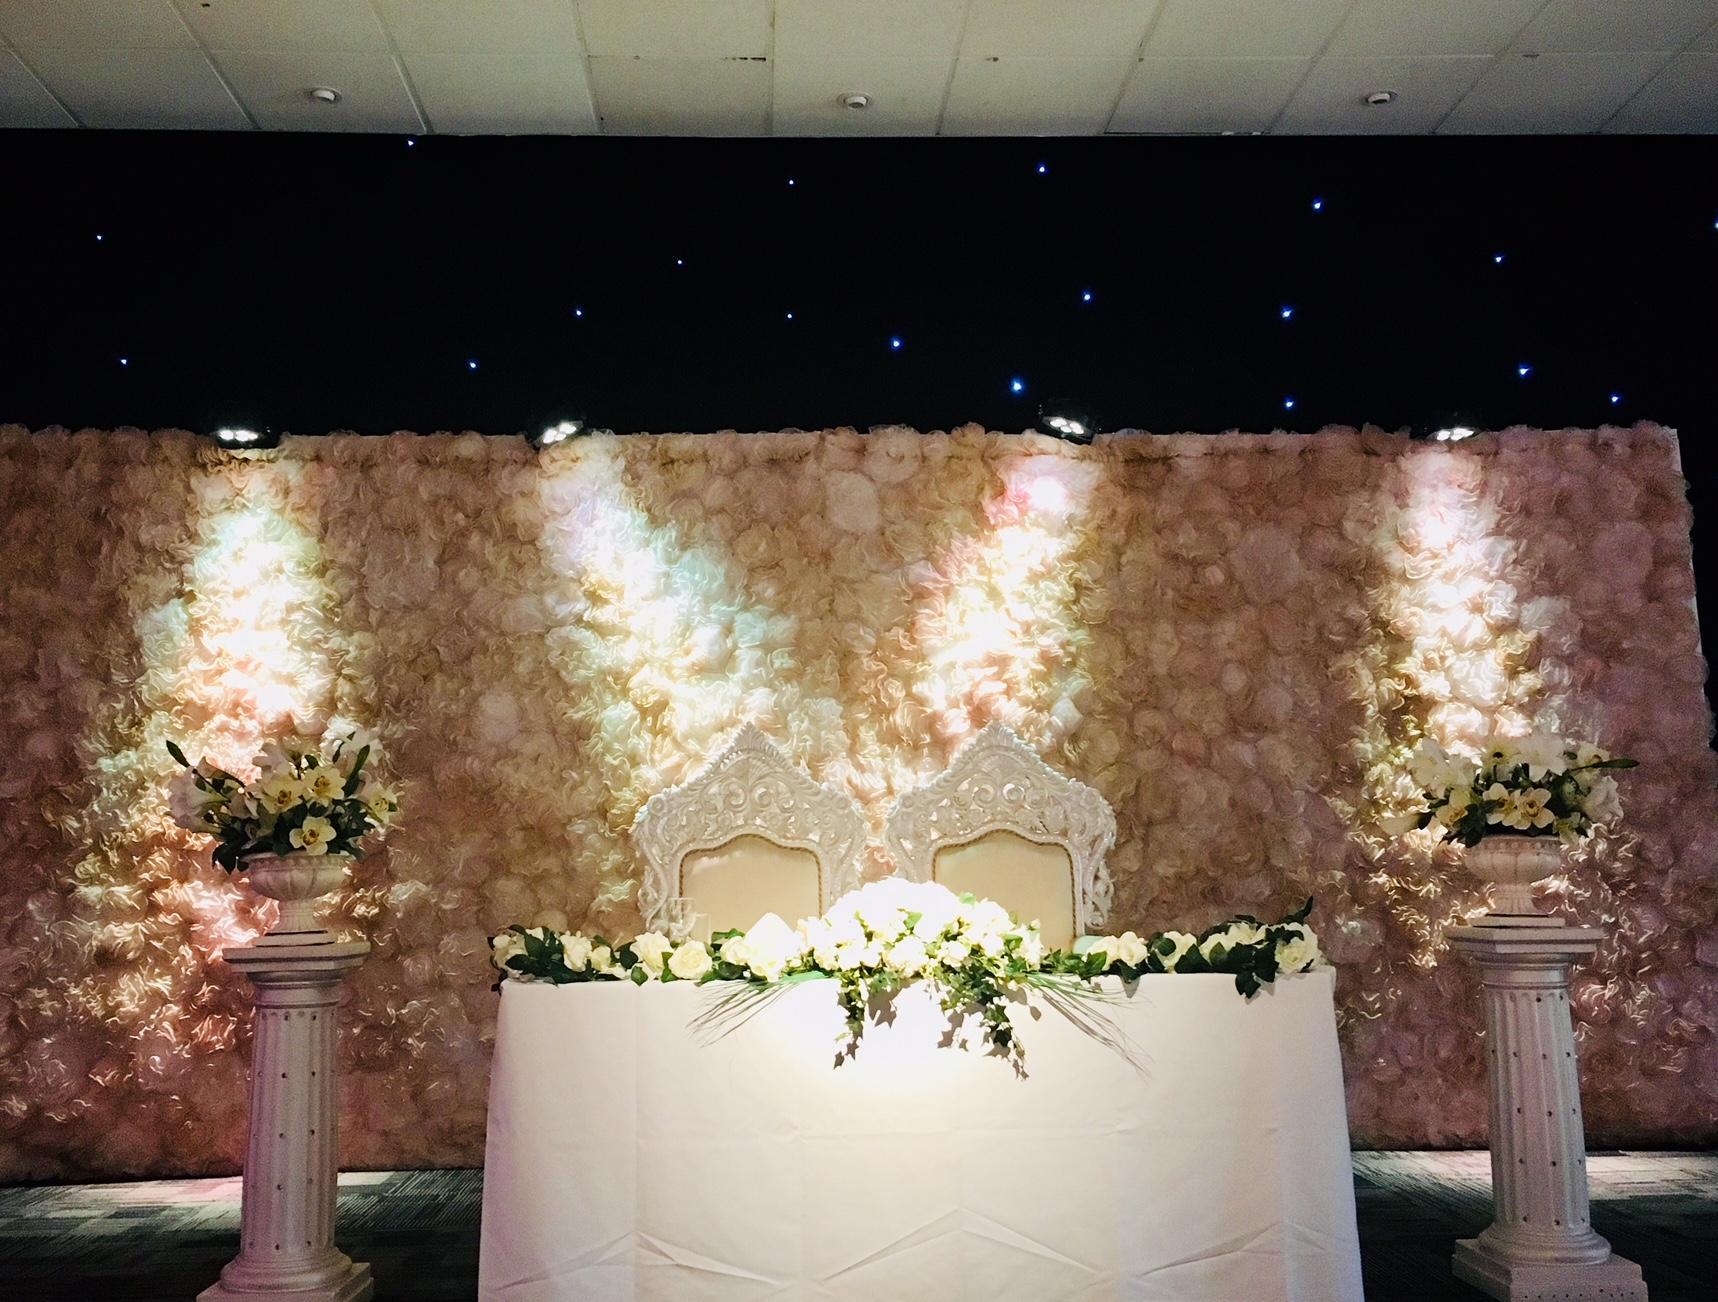 Ivory & cream head table decor